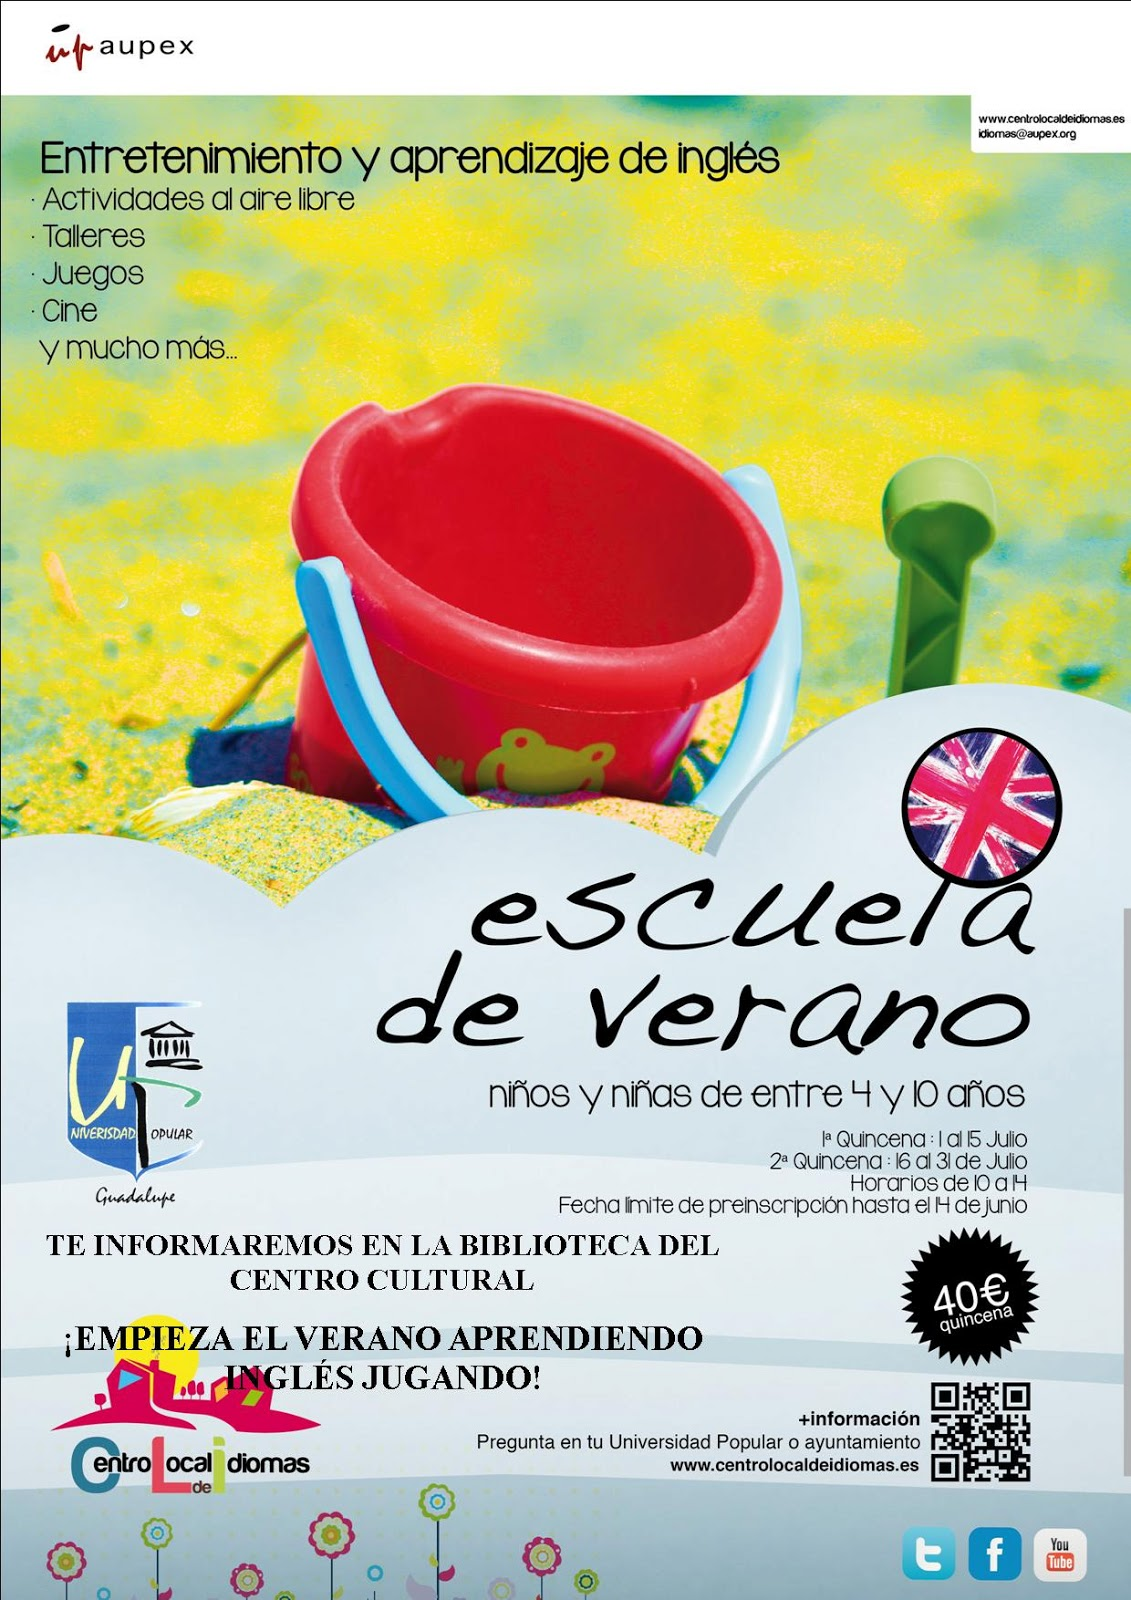 ingles curso verano espana: